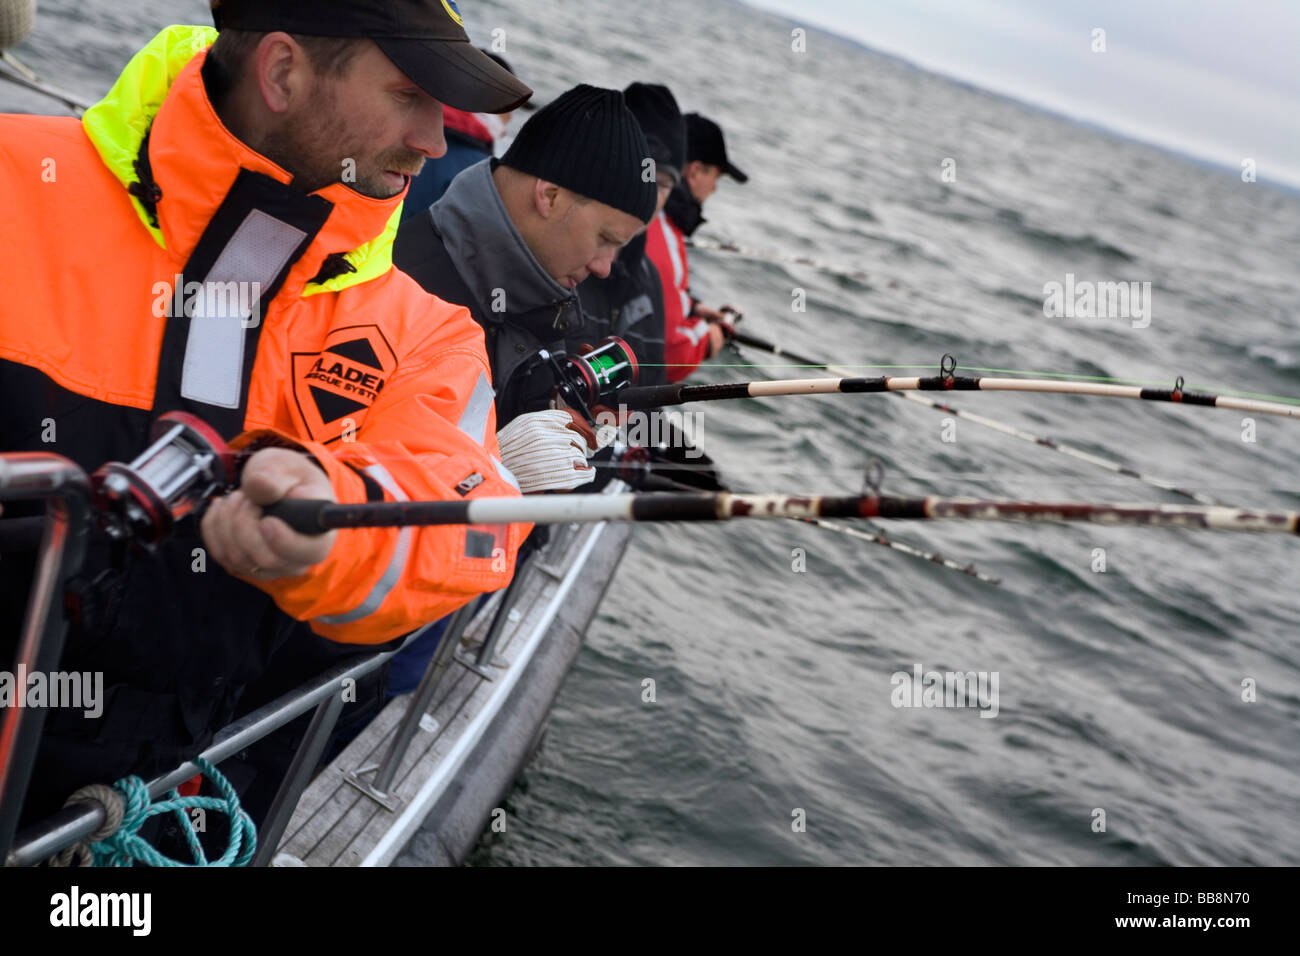 Men aboard at deep sea fishing trip Kattegat Sea Scandinavia - Stock Image